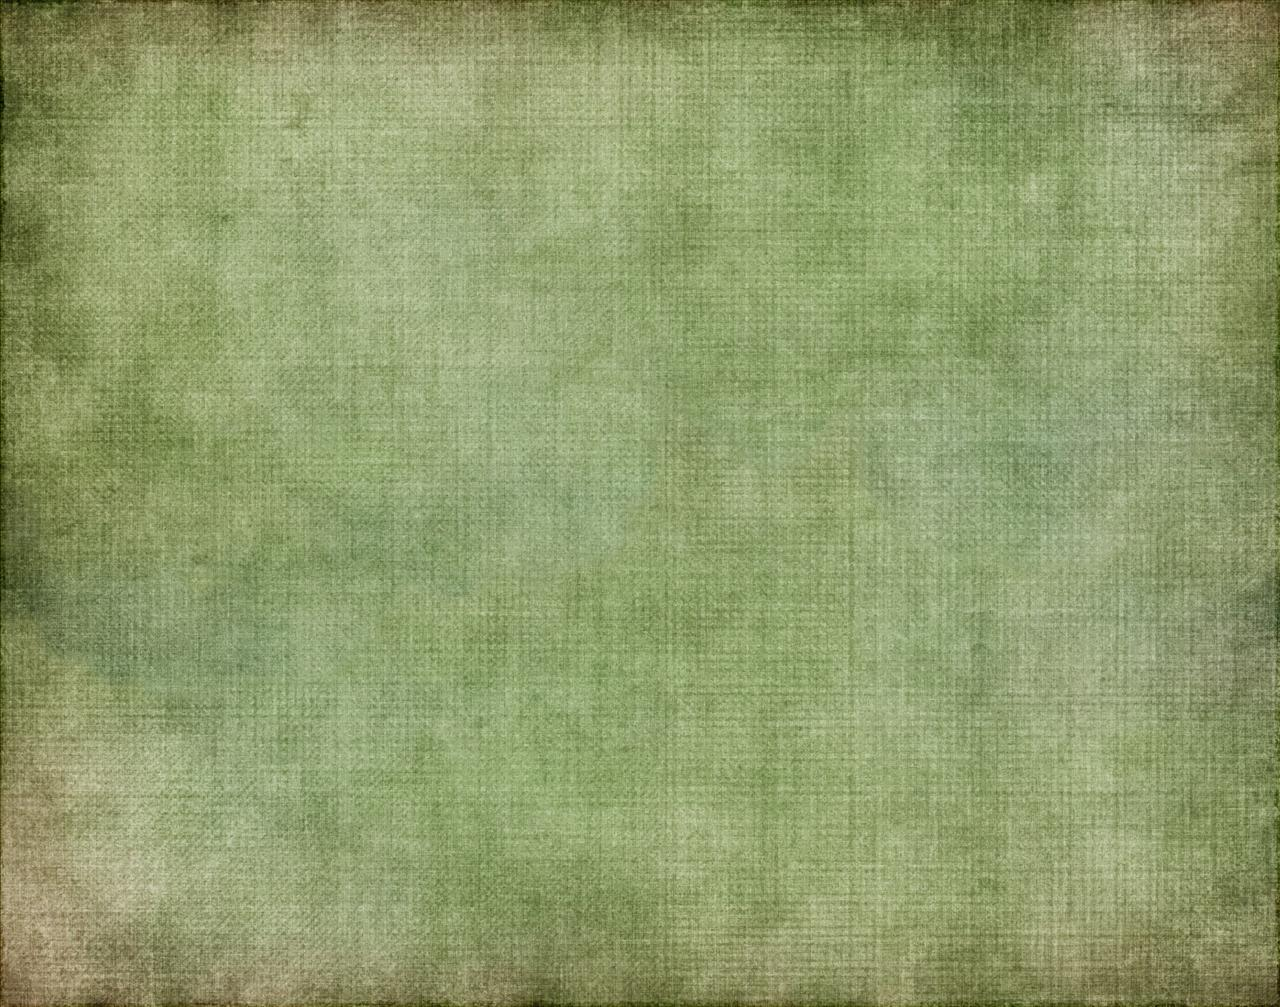 green vintage wallpaper - photo #5